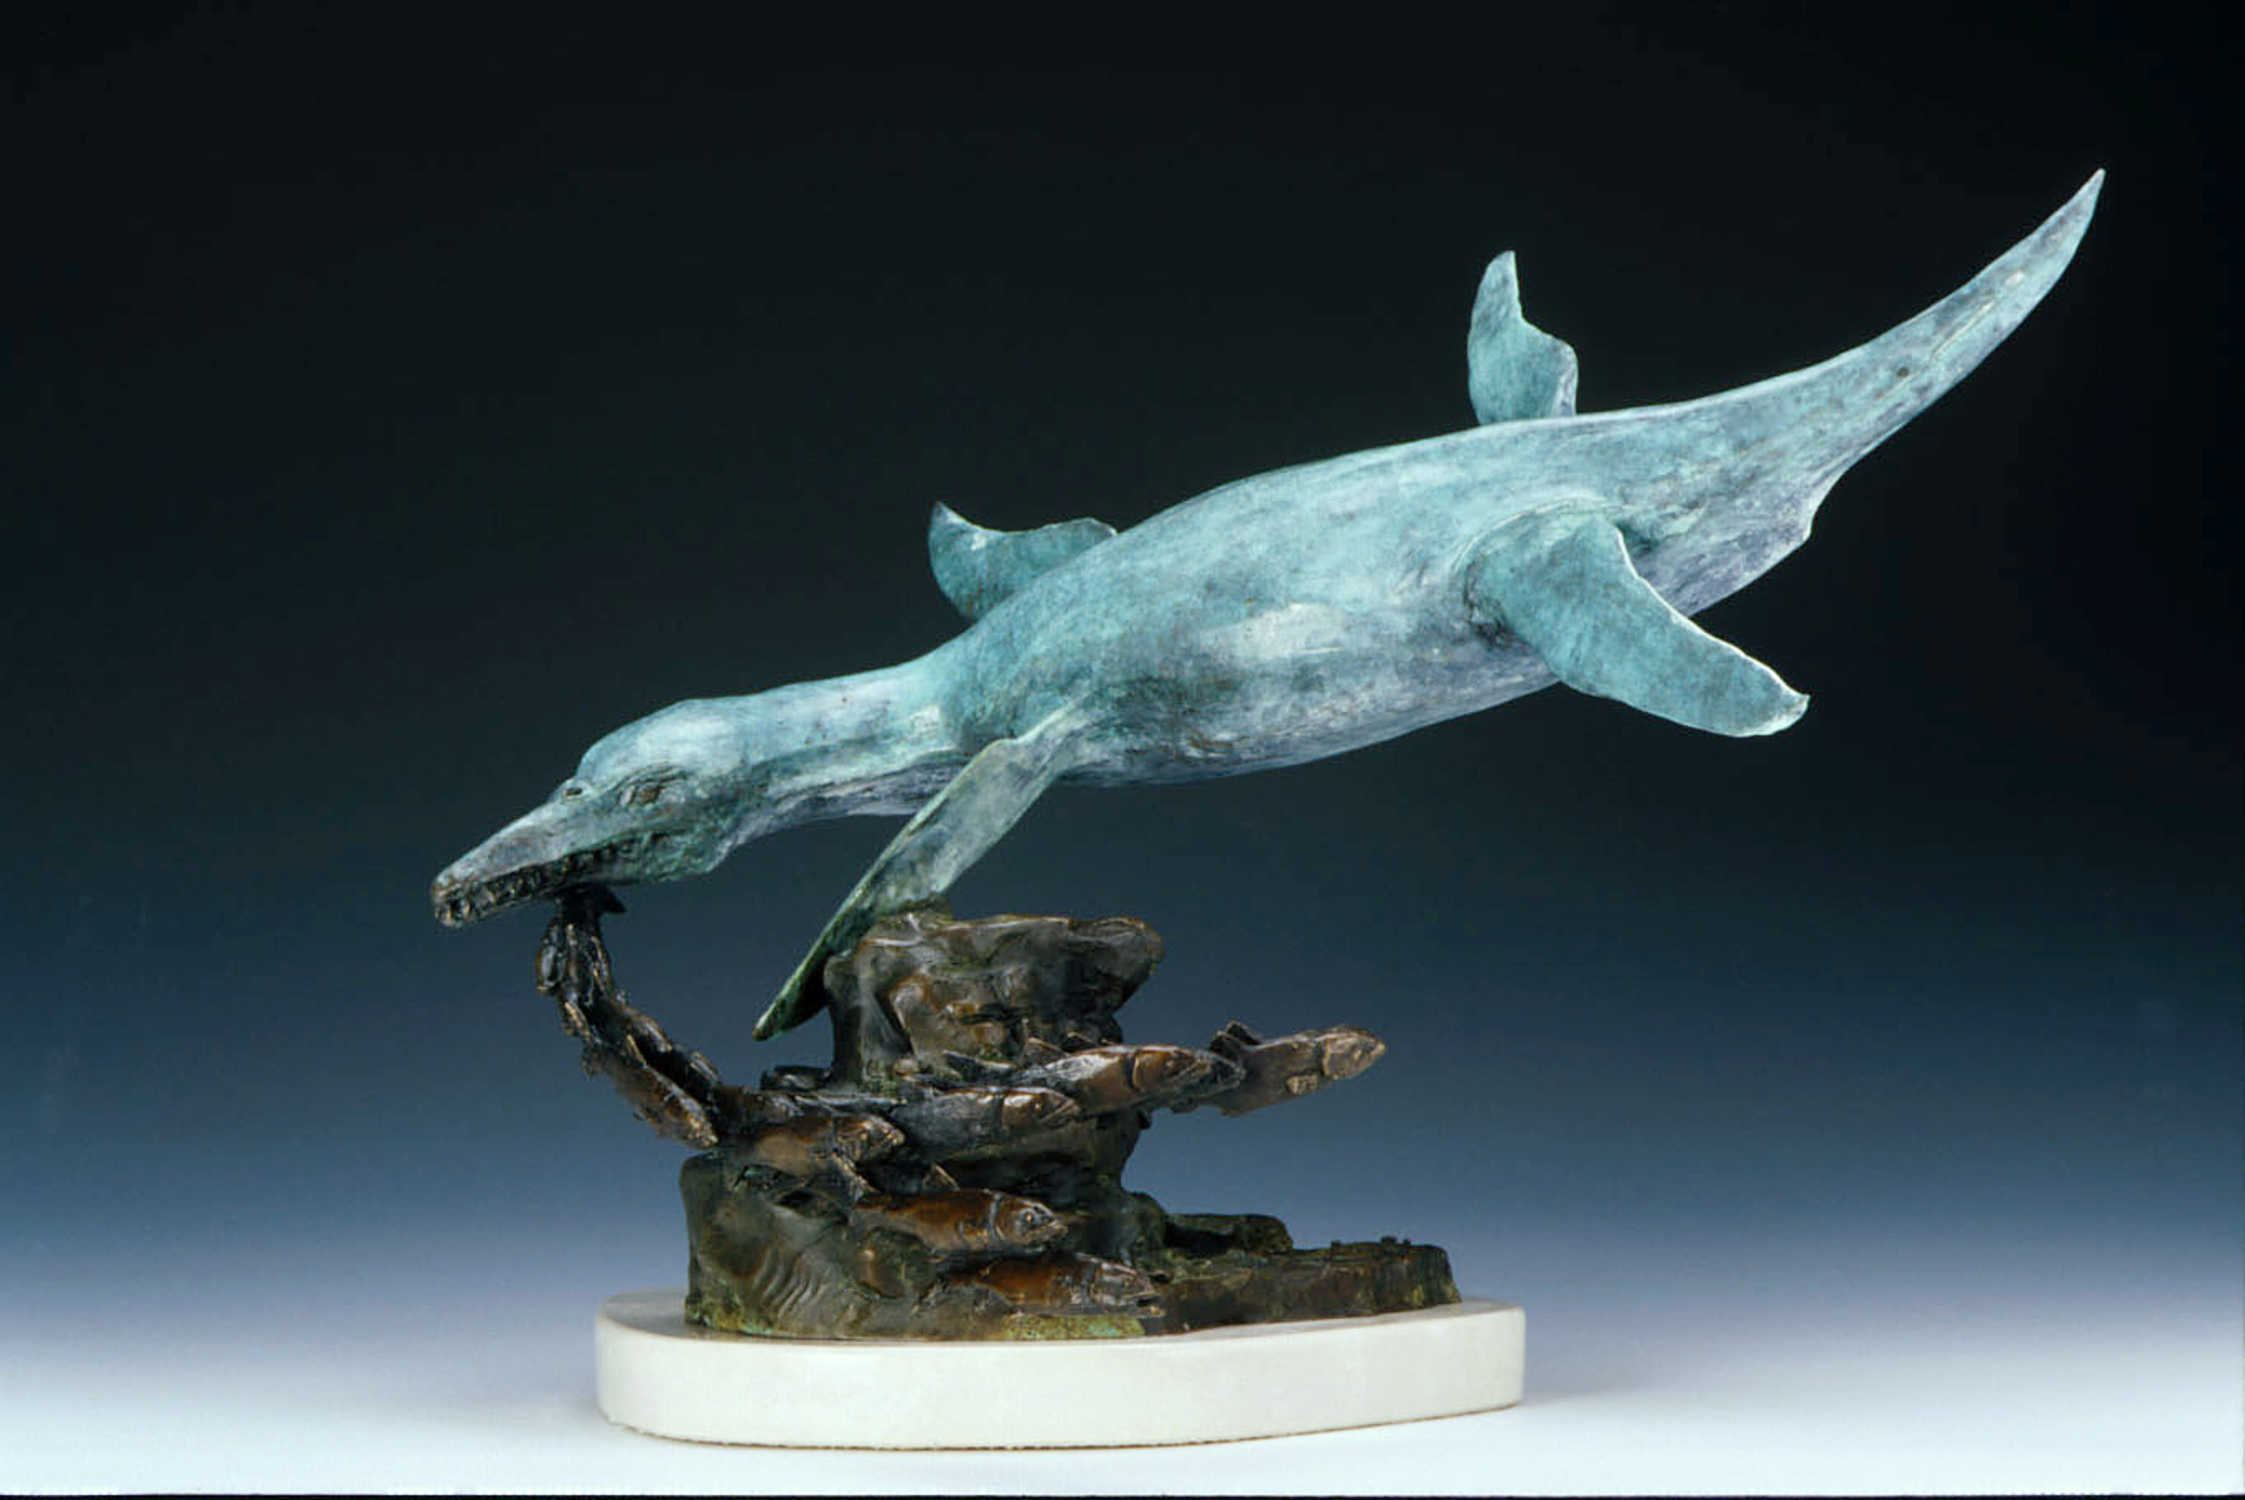 Pliosaur Artwork by james herrmann